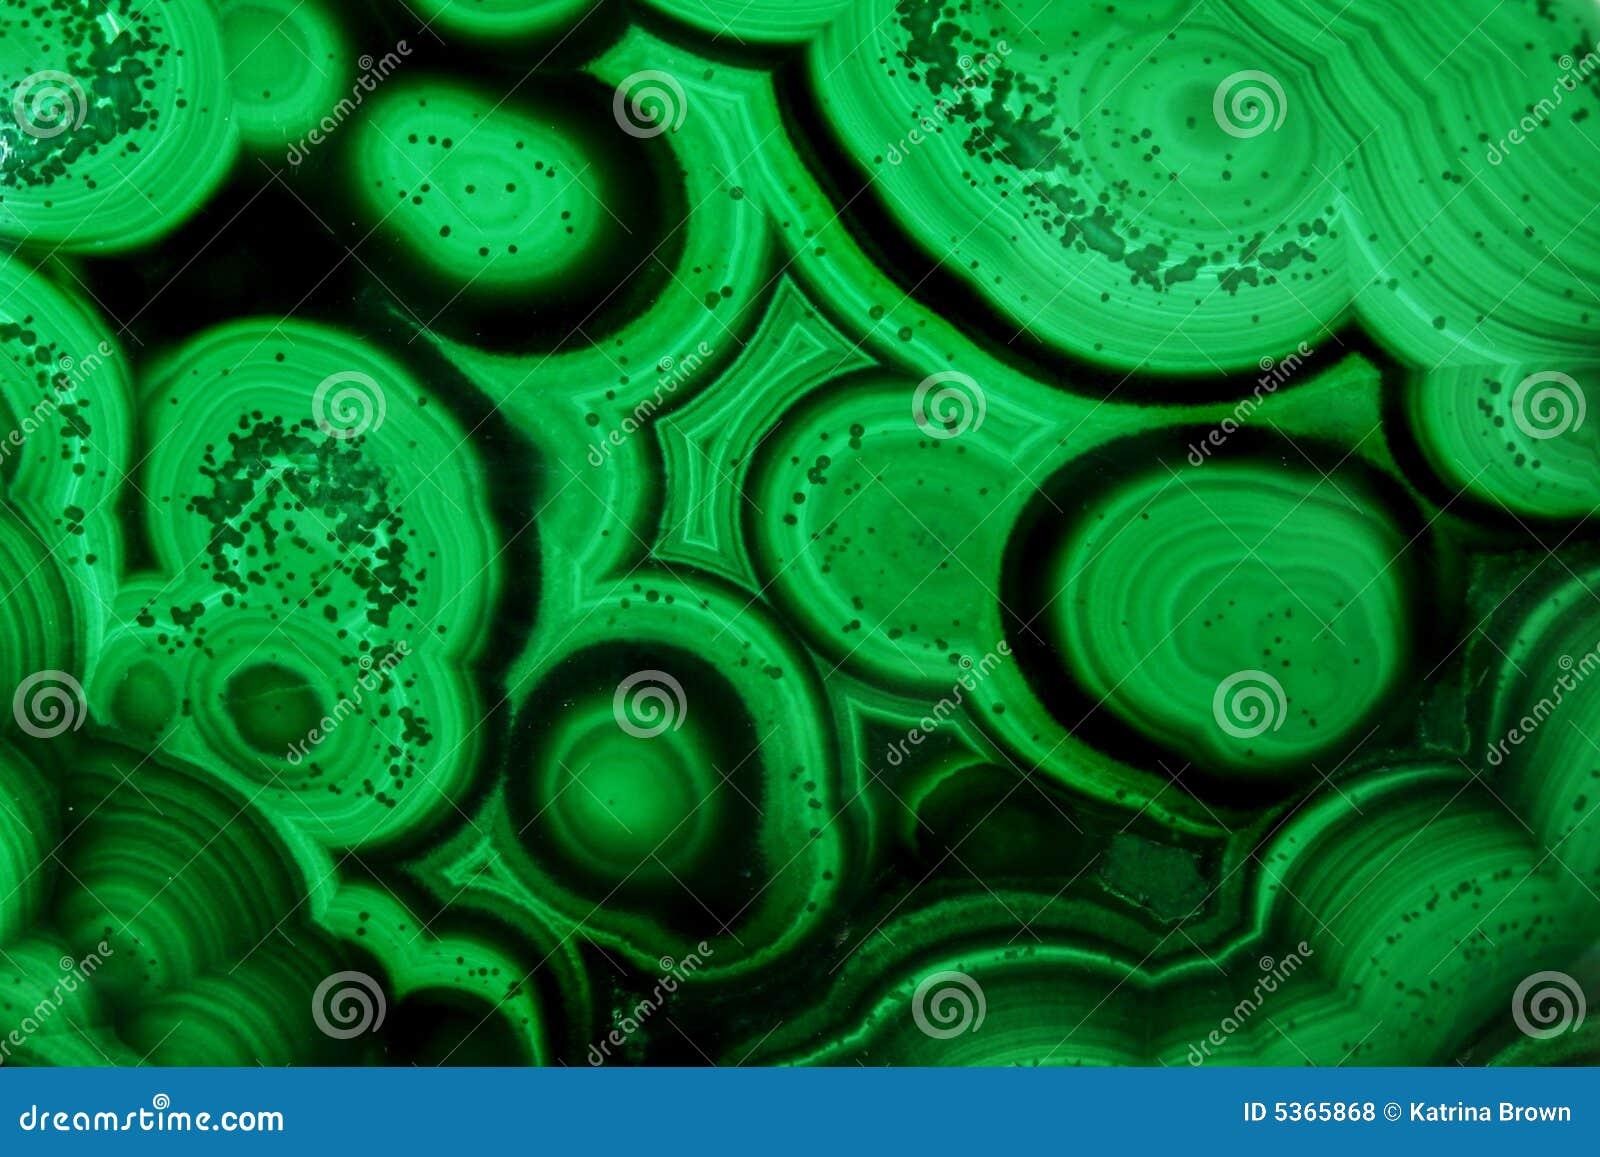 Pattern Malachite Natural Gem Crystal Close Up